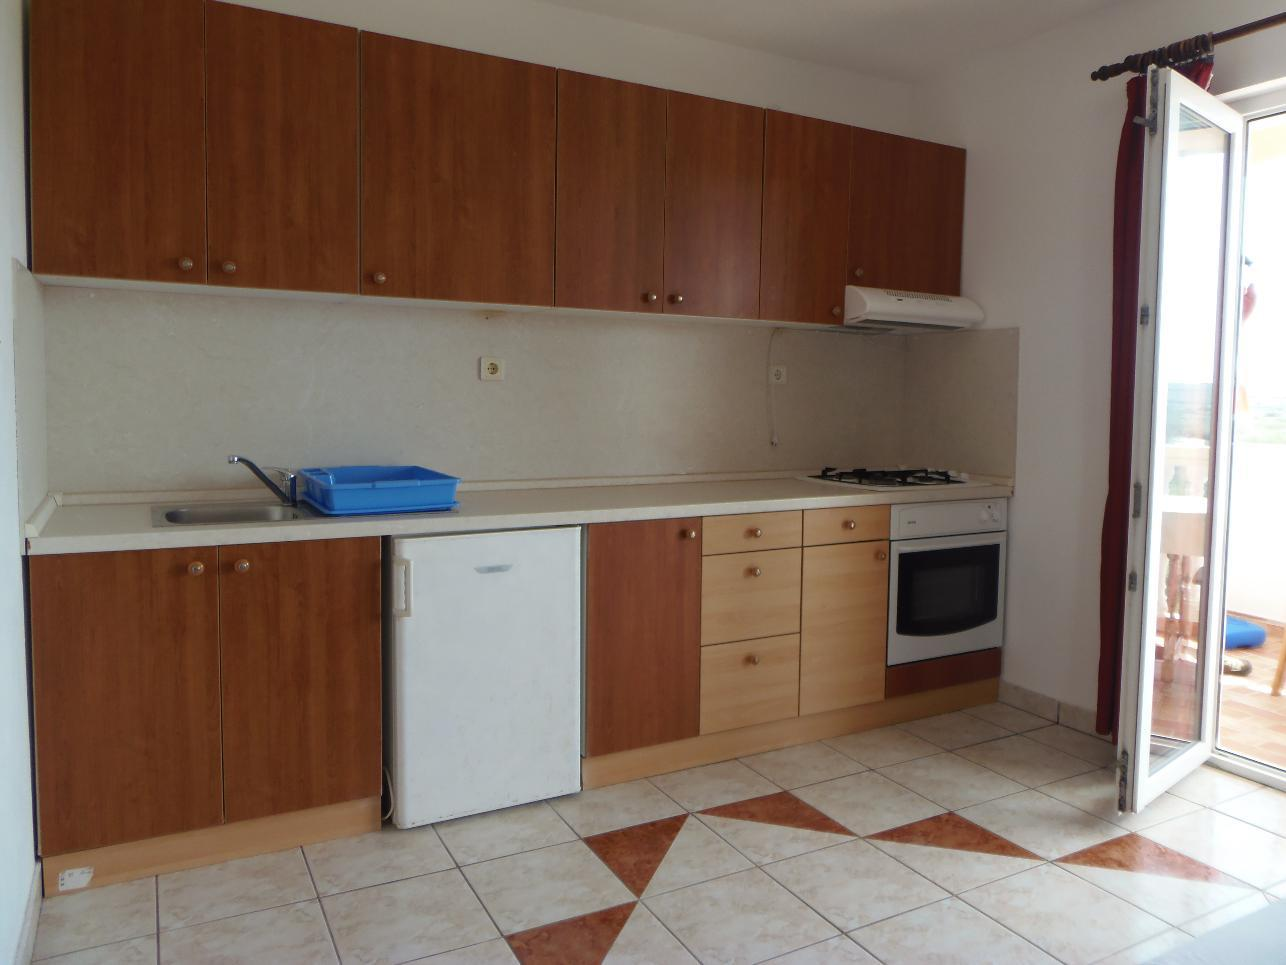 2235 - Povljana - Appartementen Kroatië - A2 veliki (2+2): keuken